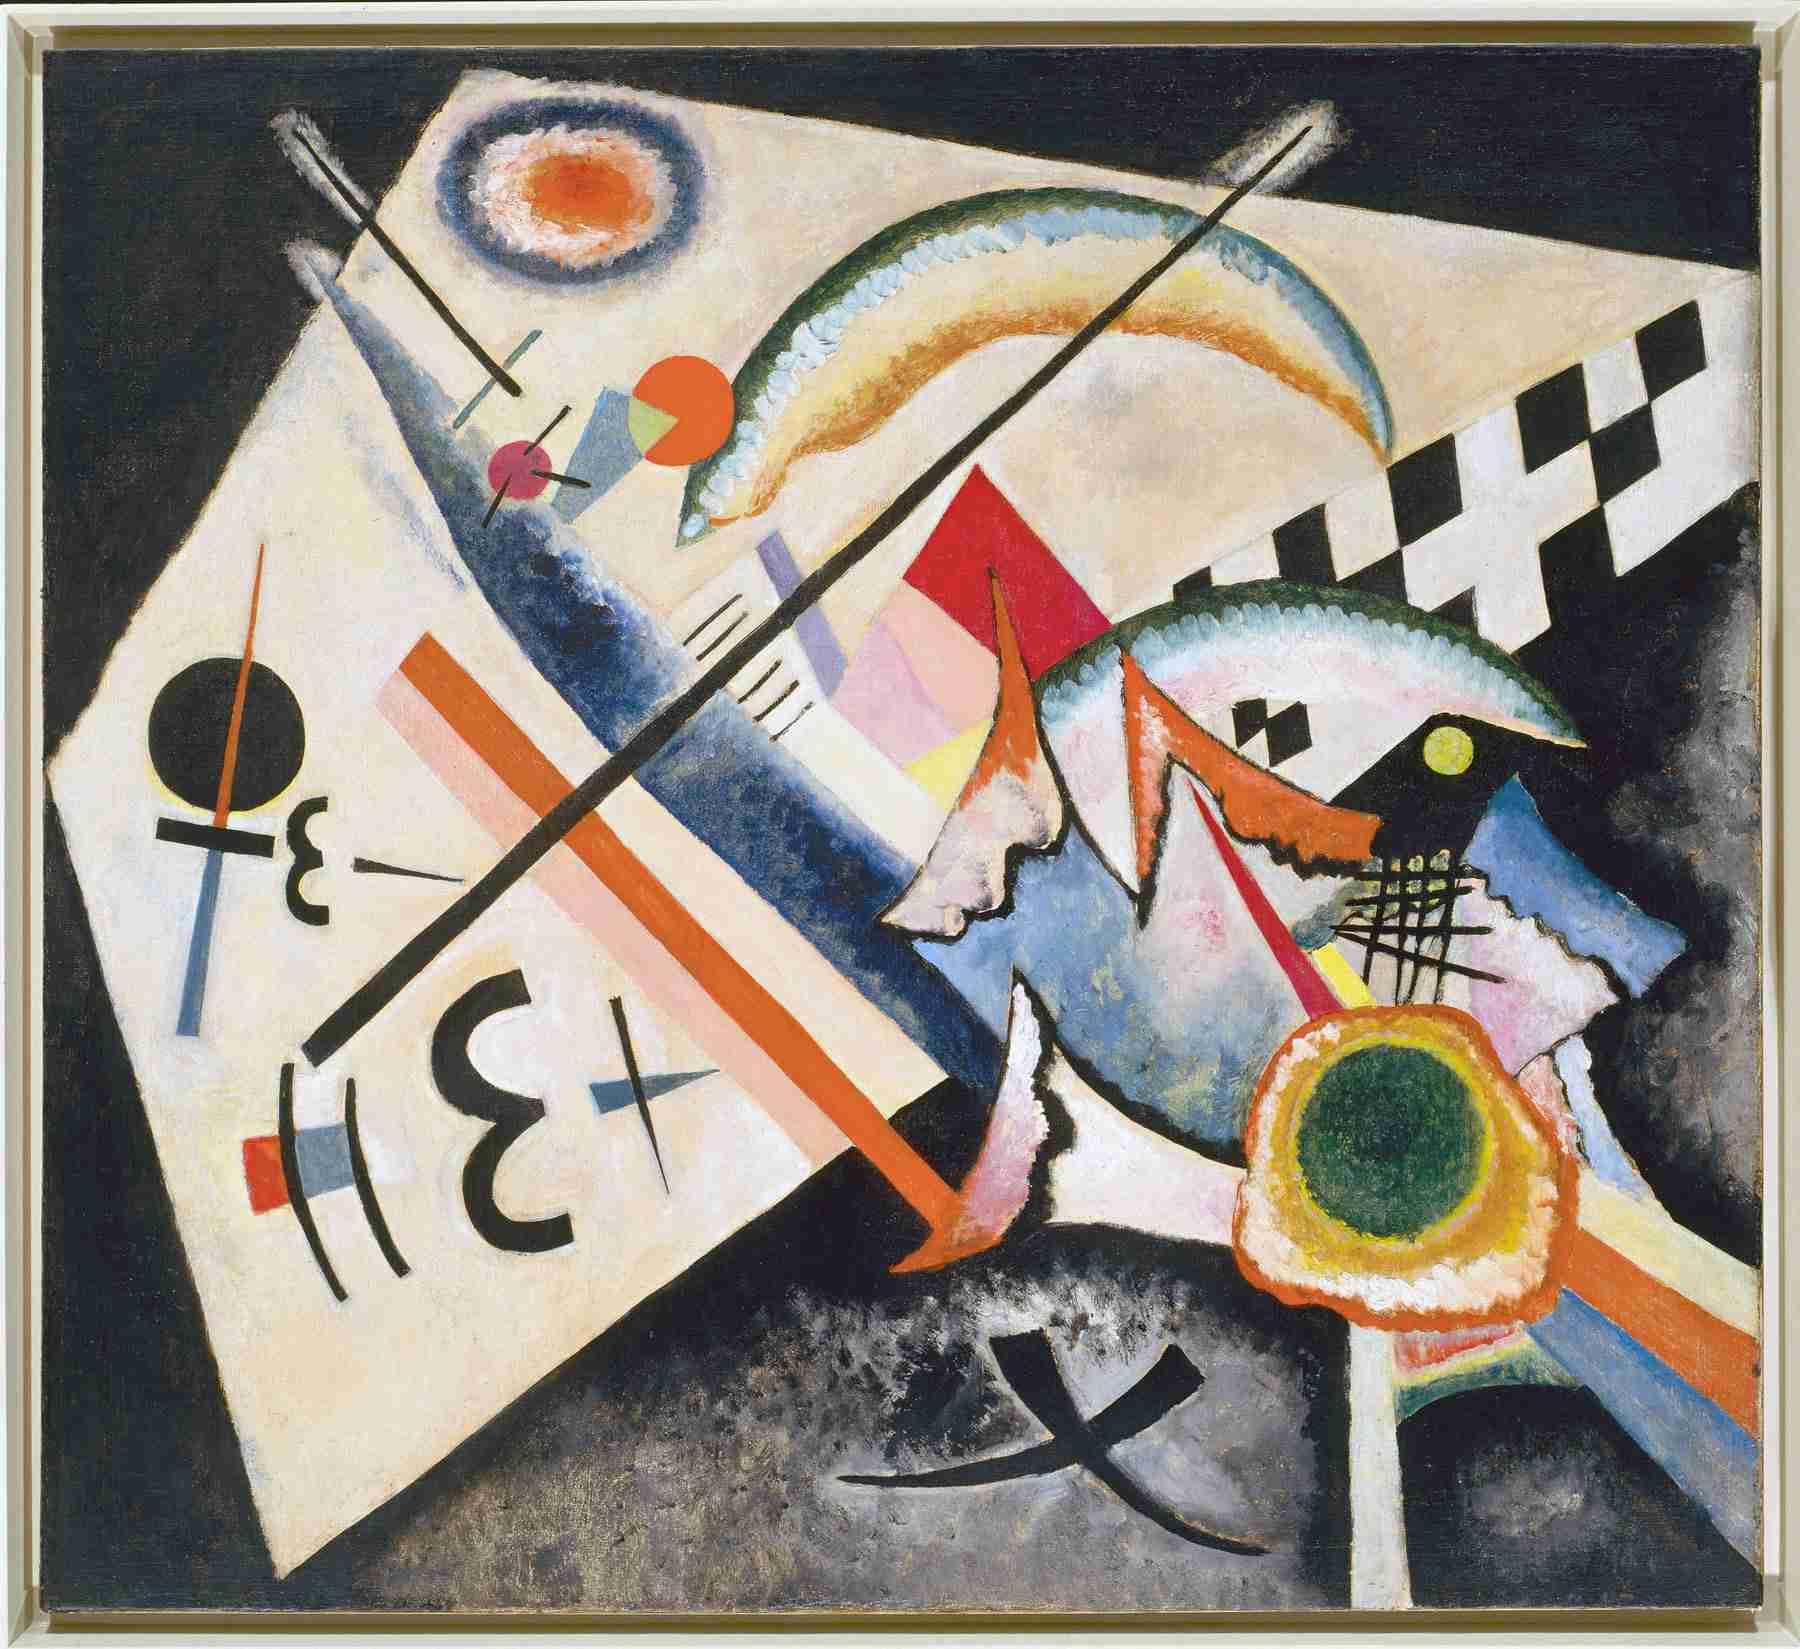 Wassily Kandinsky (Russian, 1866-1944) Wassily Kandinsky (Russian, 1866-1944). White Cross (Weißes Kreuz), January-June 1922. Oil on canvas. 39 9/16 x 43 1/2 in. (100.5 x 110.6 cm). Peggy Guggenheim Collection, Venice 76.2553.34. Solomon R. Guggenheim Foundation, New York.